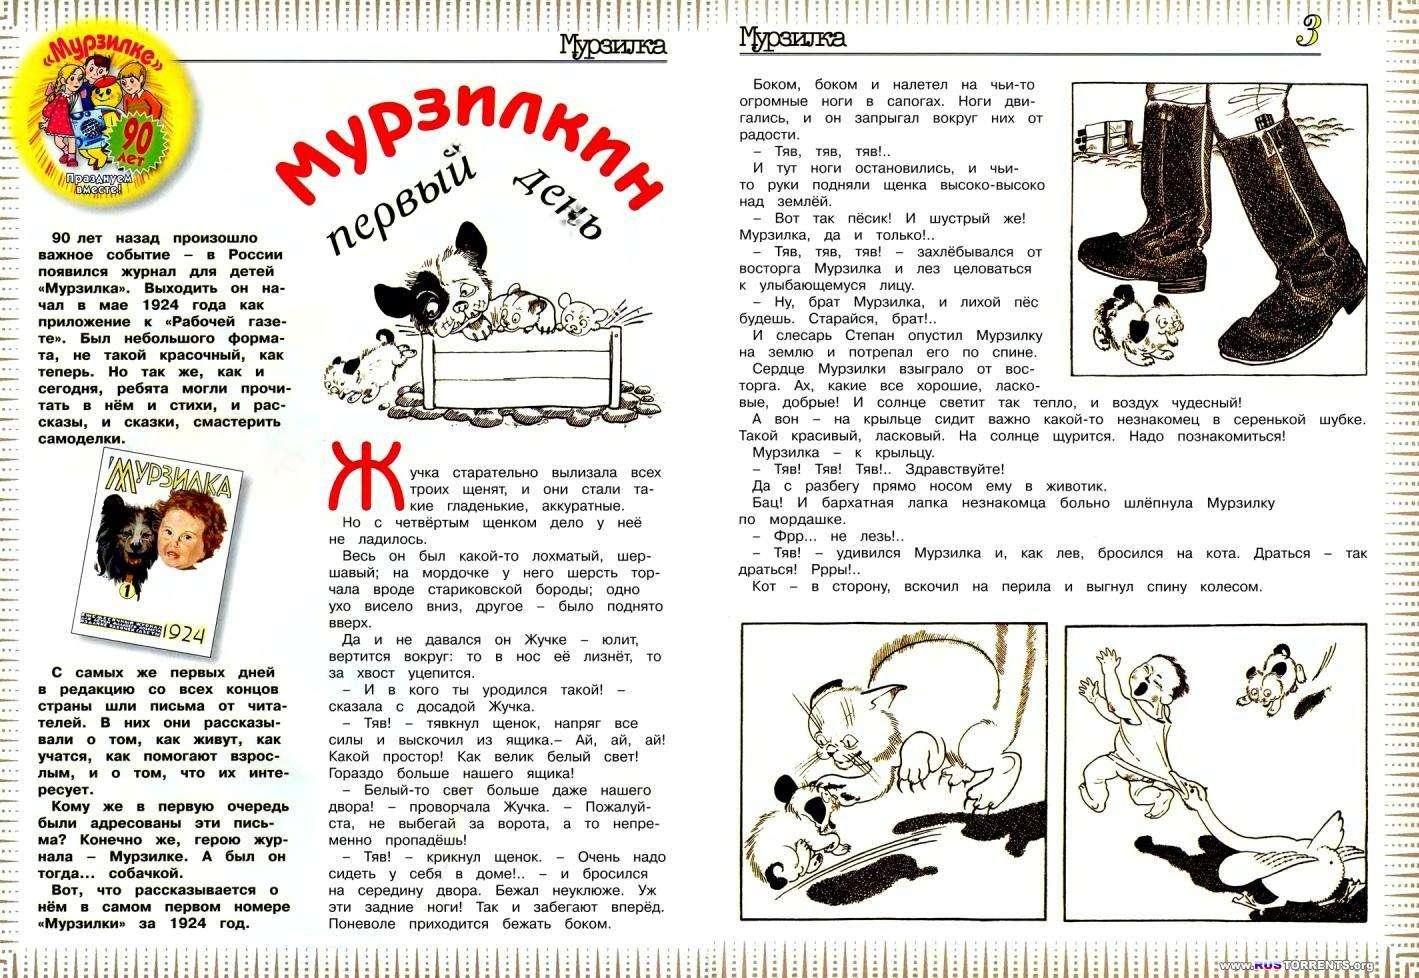 Подшивка журналов | Мурзилка №1-9 | DjVu